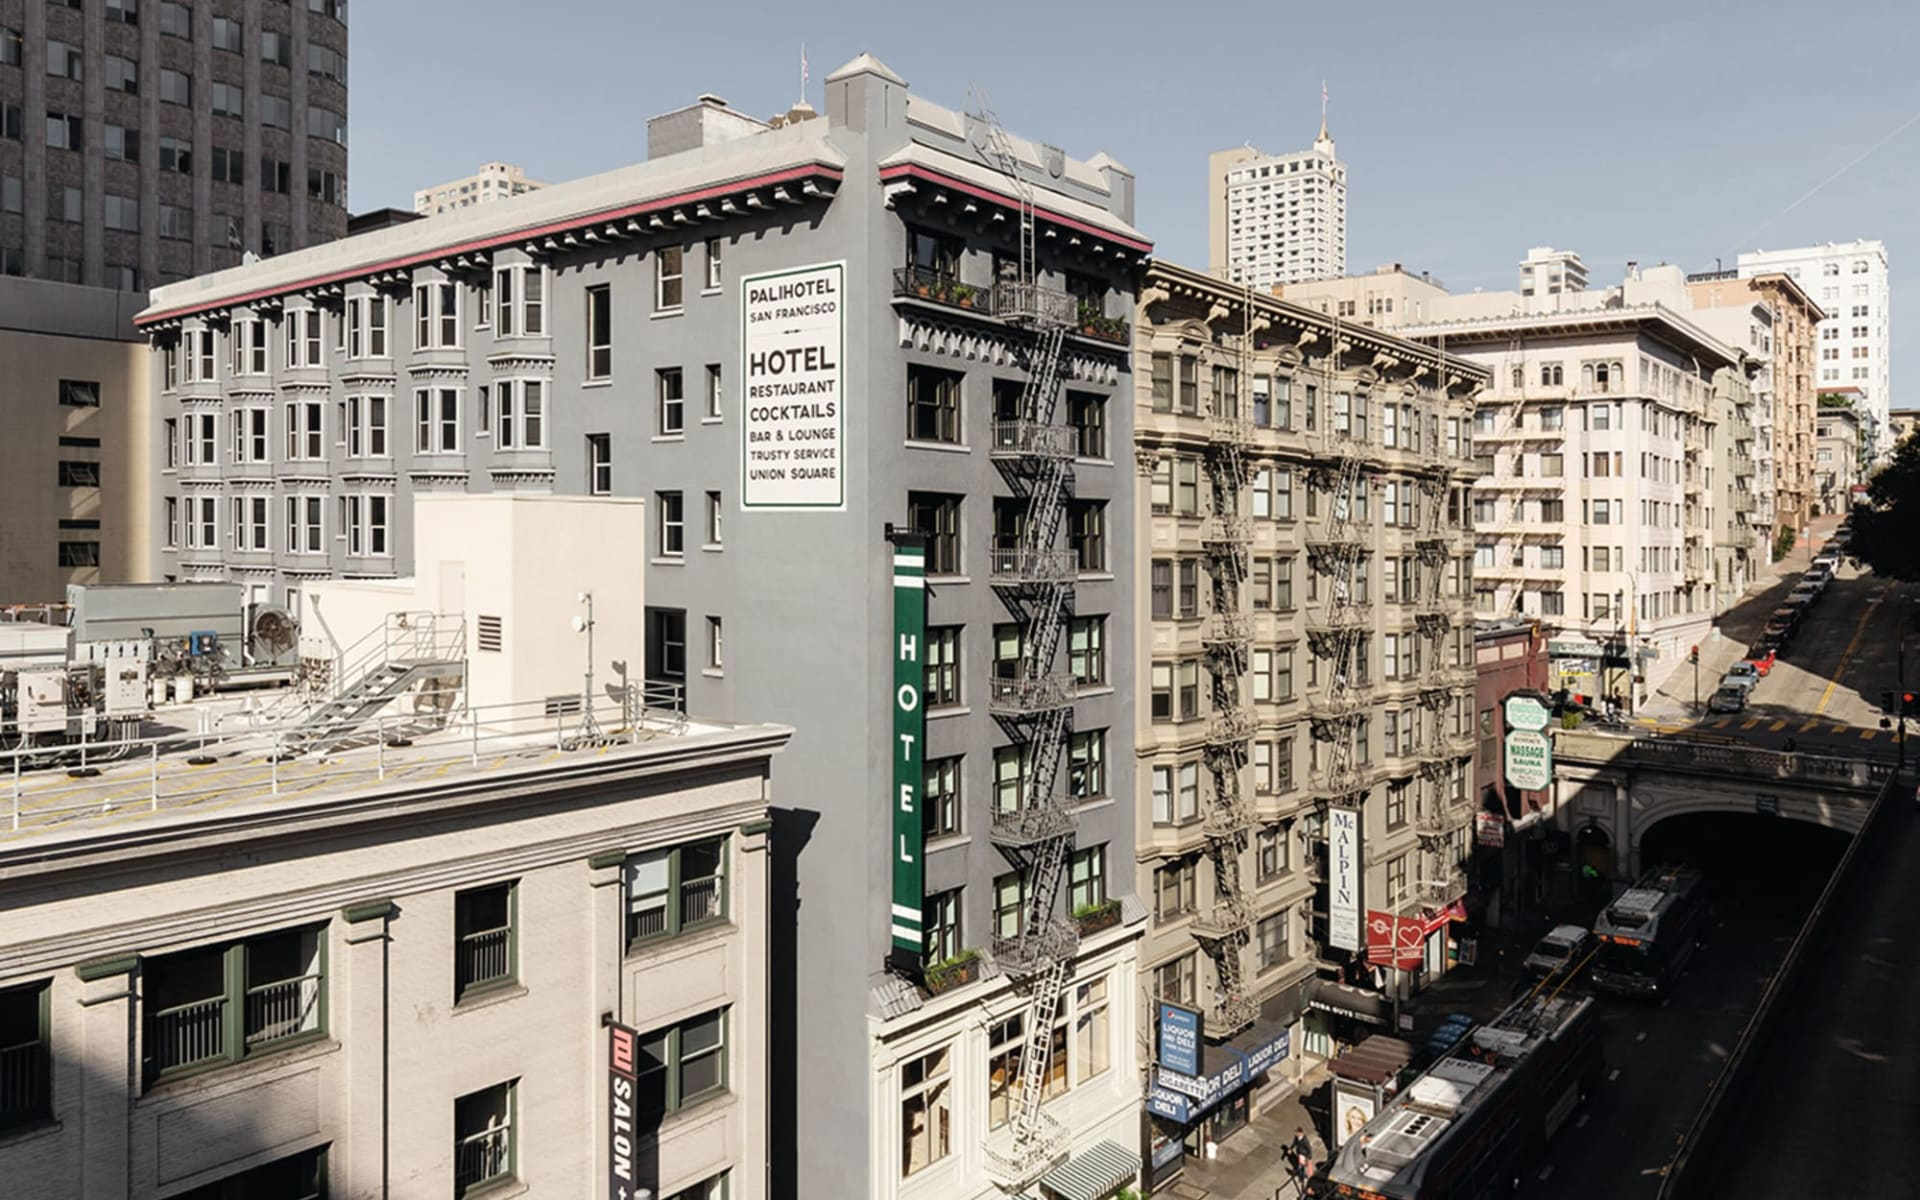 Palihotel (ehemals Mystic Hotel by Charlie Palmer) in San Francisco: Exterior_Palihotel_SFO_Palihotel_web!